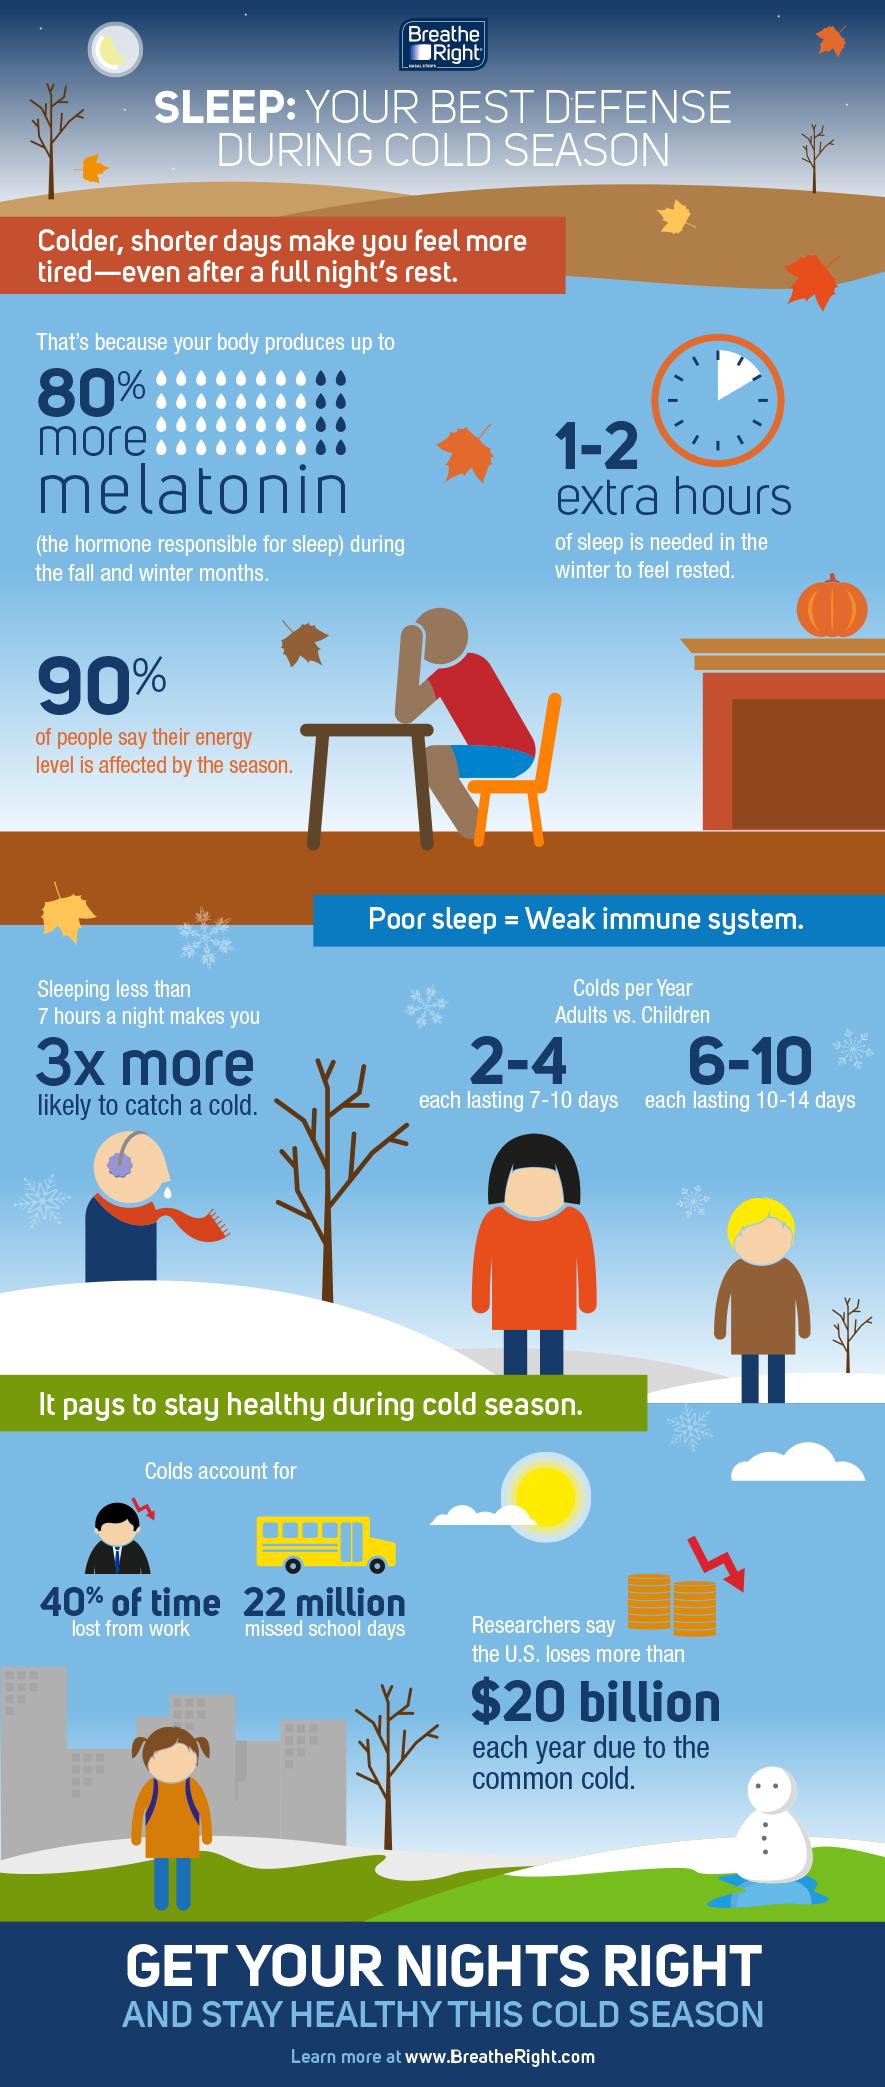 read more : https://www.breatheright.com/sleep-better-tips/sleep/cold-season.html